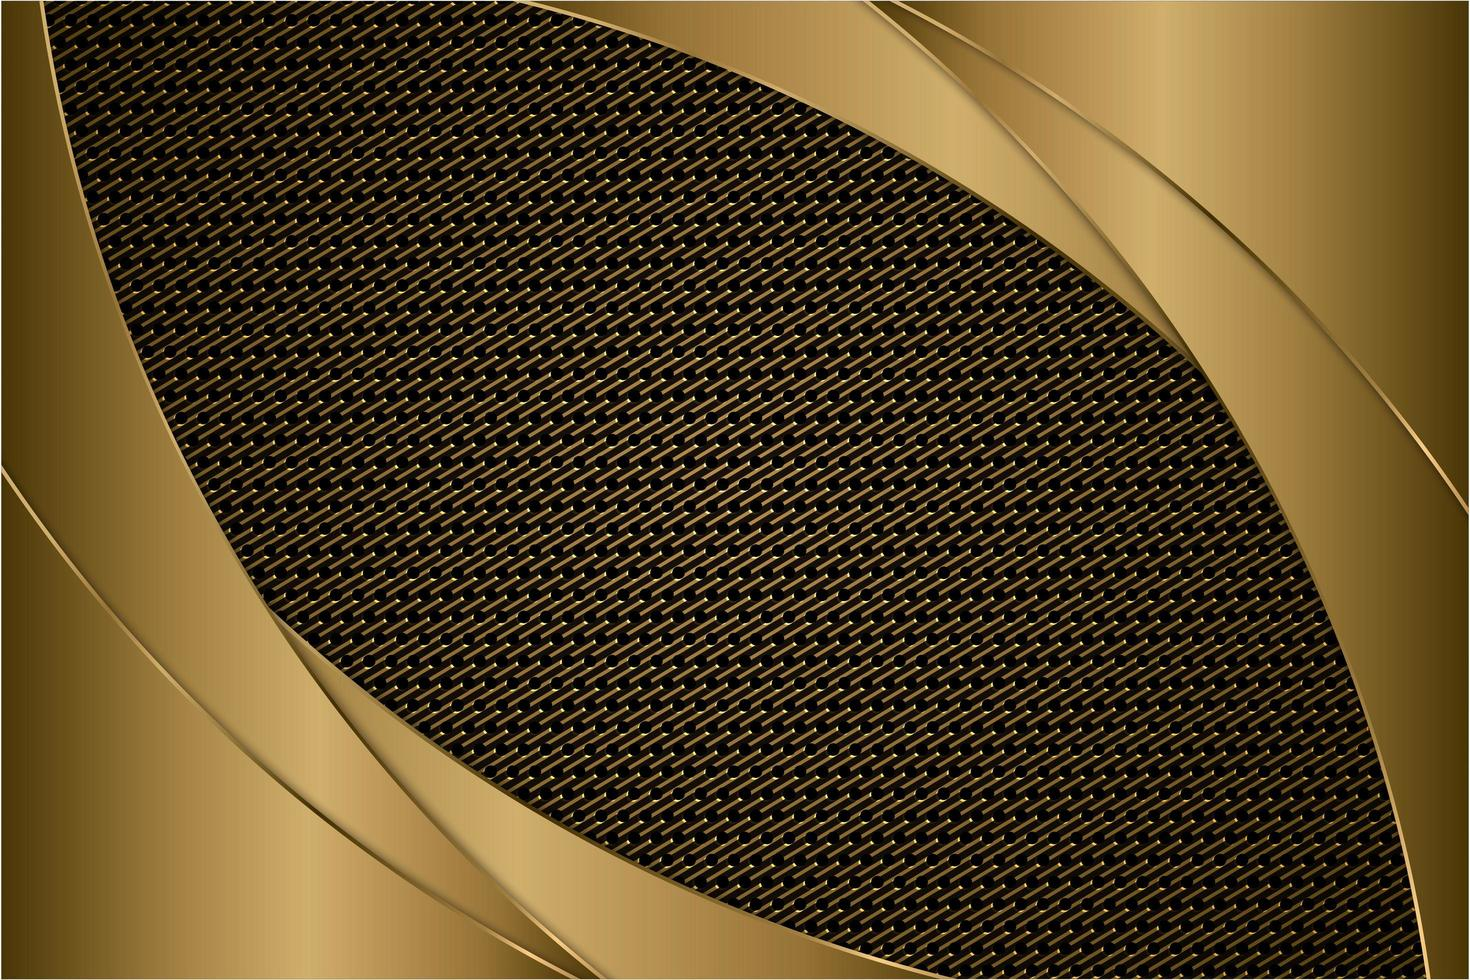 Metallic Gold gebogene Paneele mit Kohlefaser Textur vektor